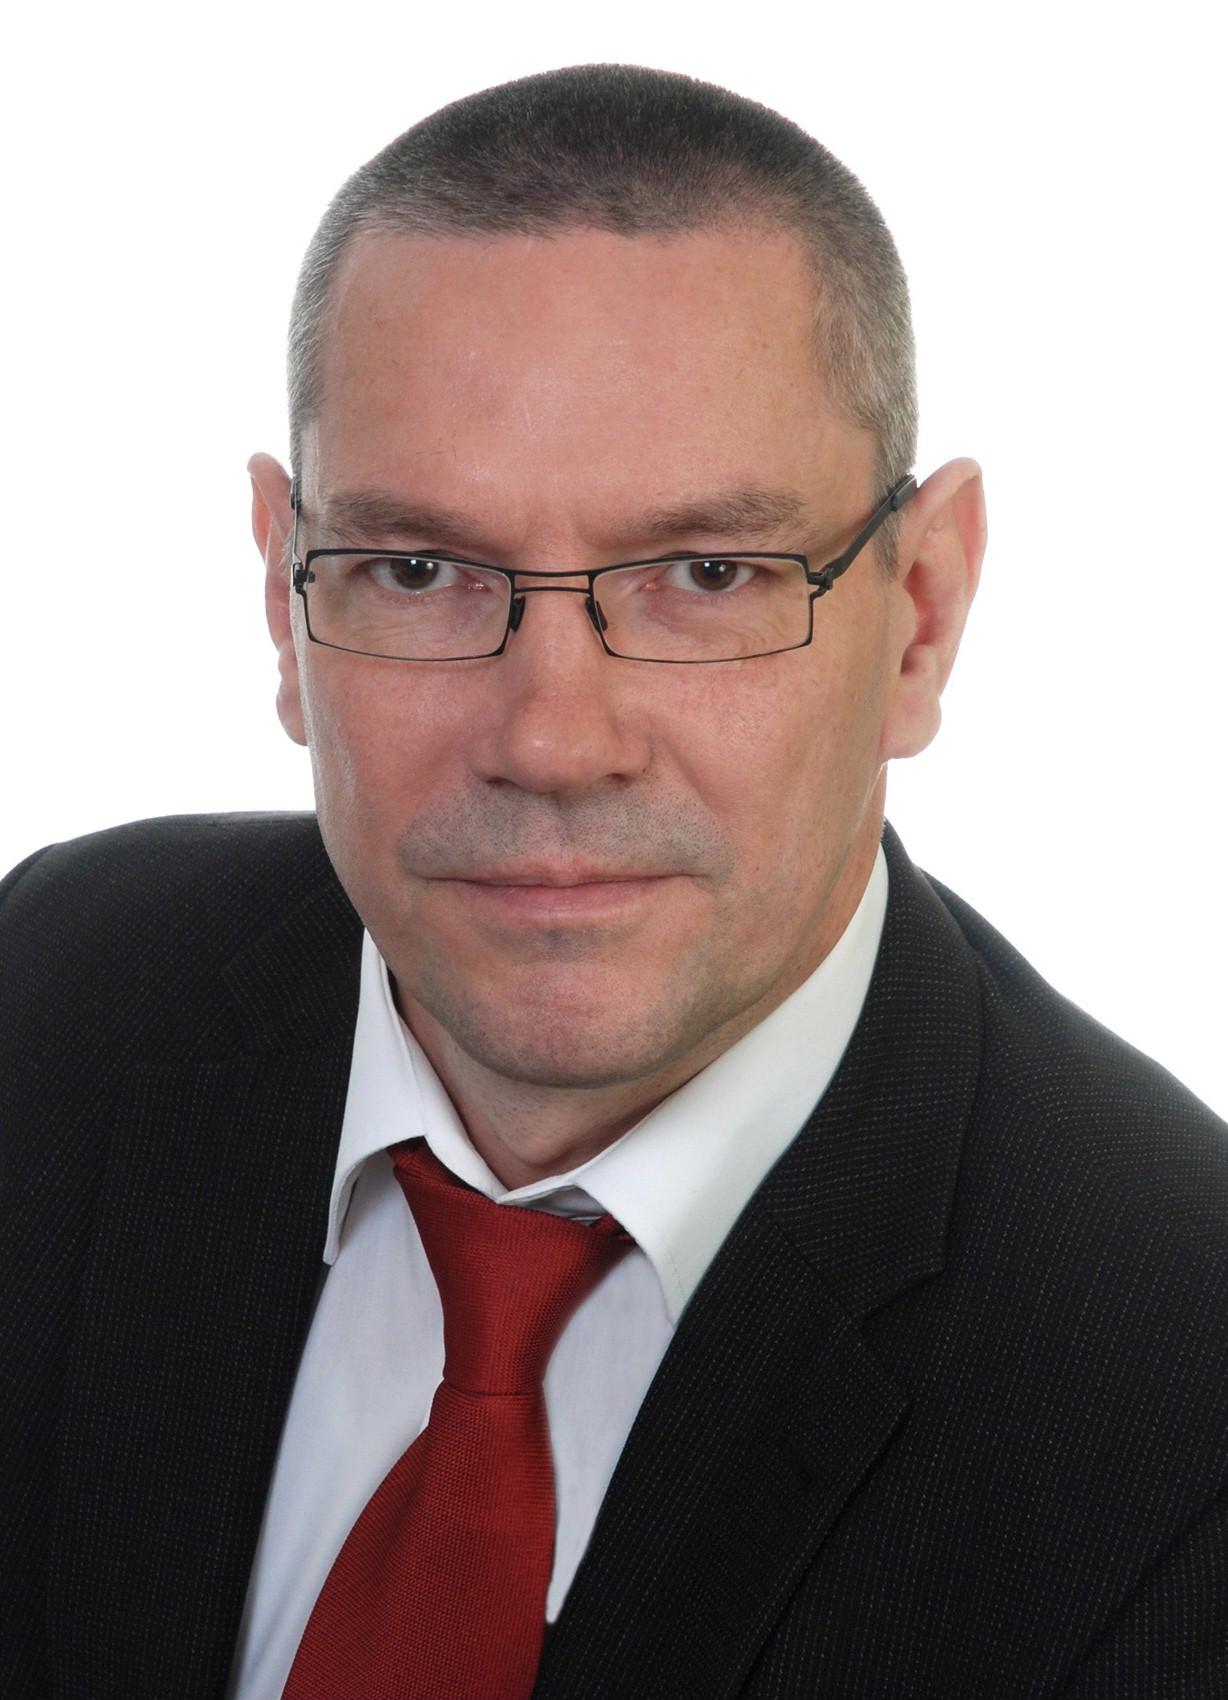 Matthias Choschzick, M.D.